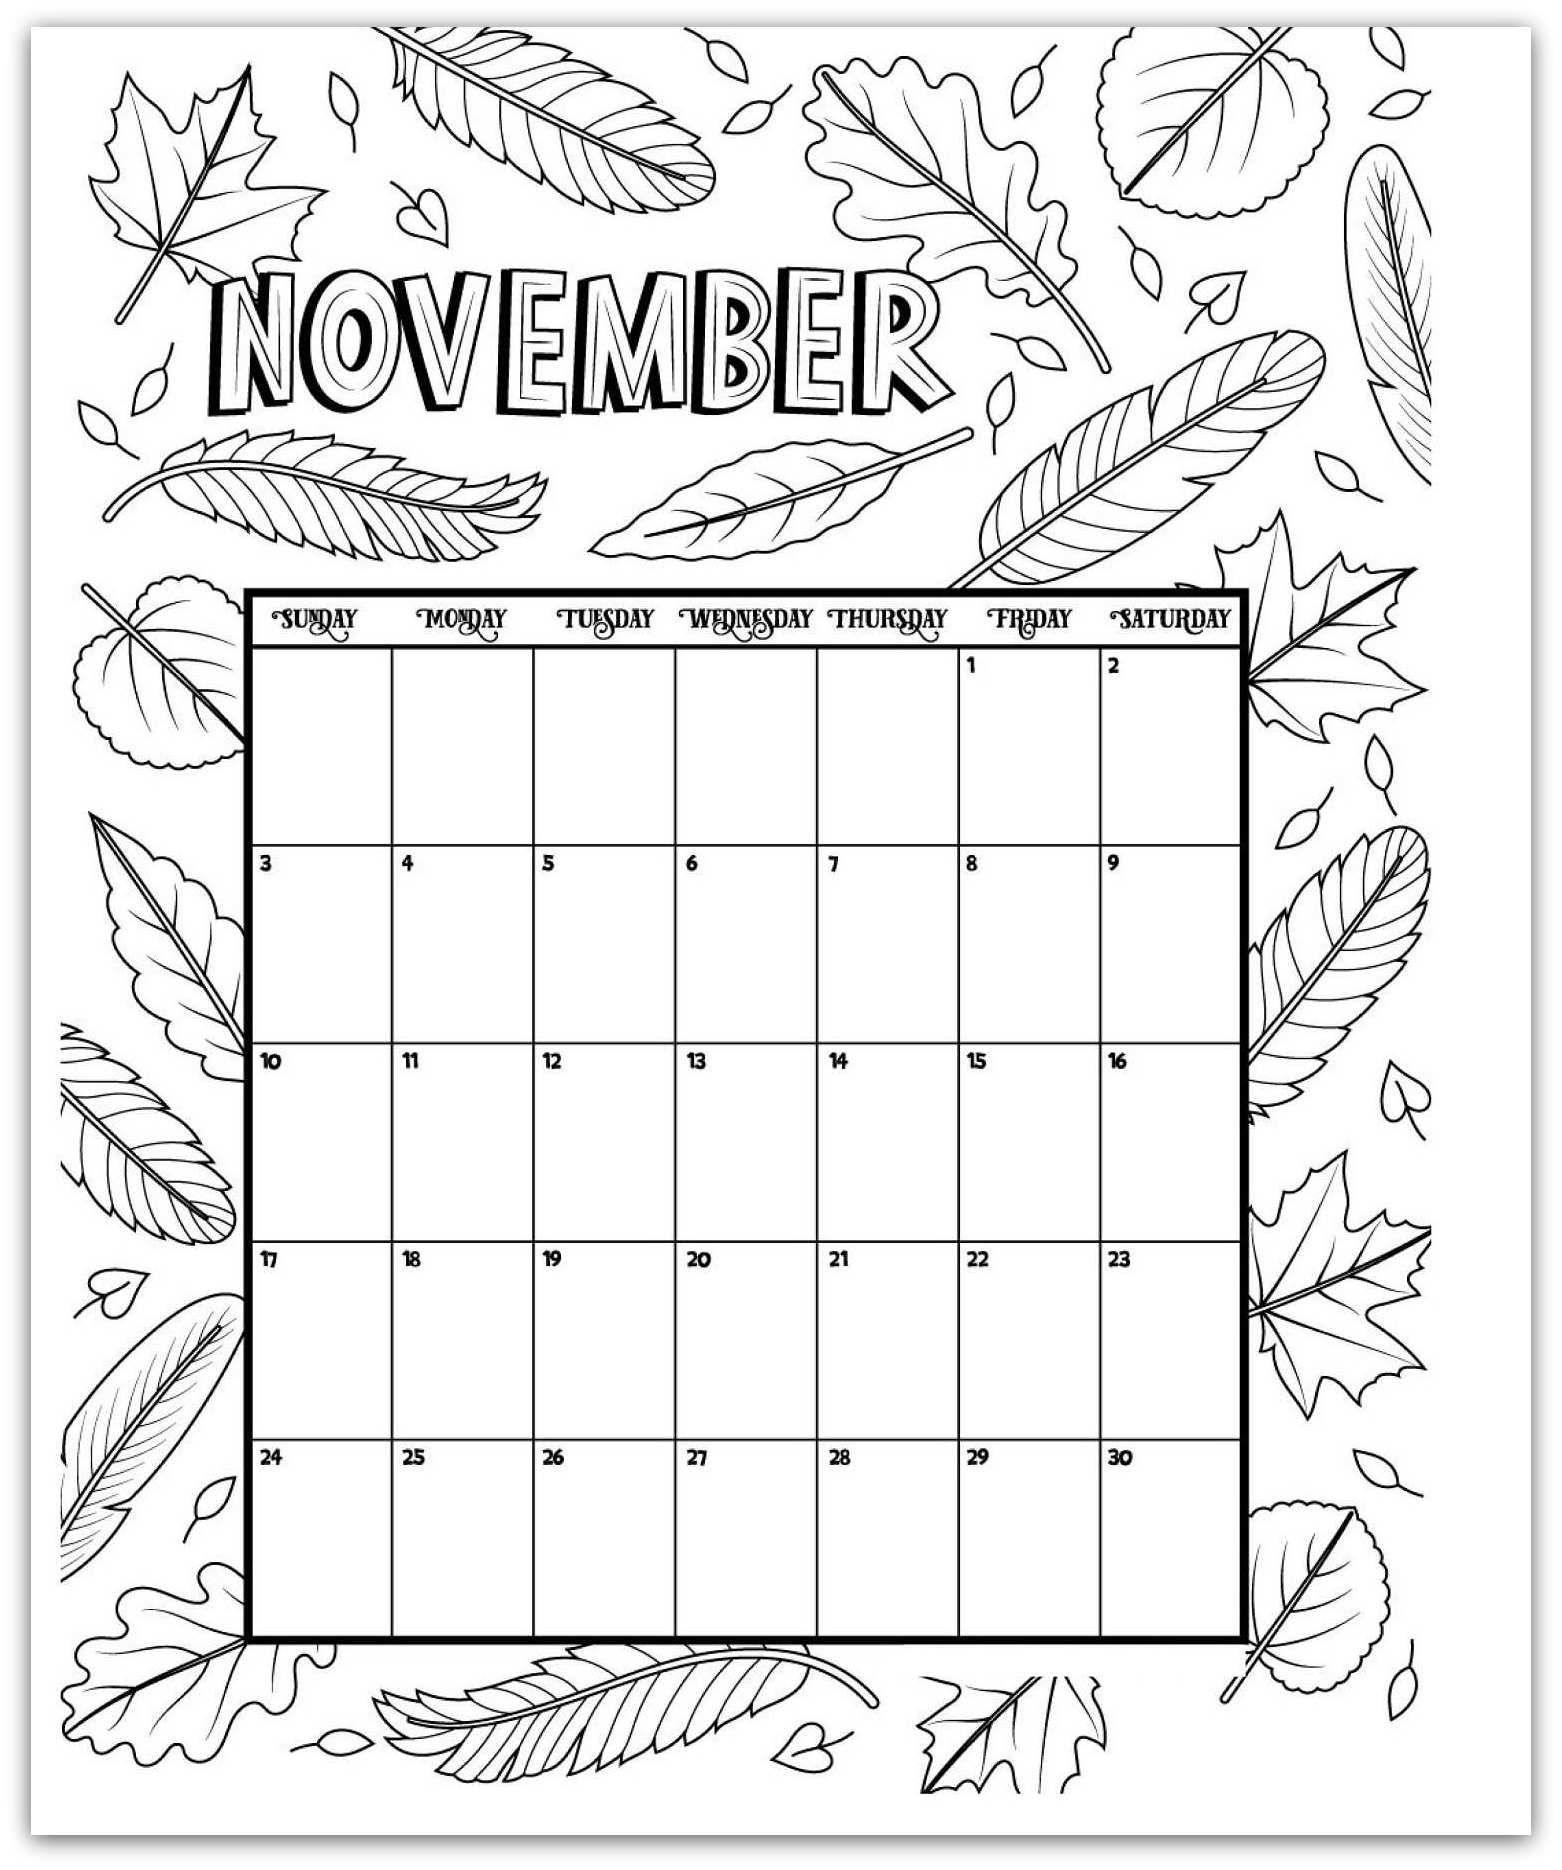 November Coloring Page Printable Calendar